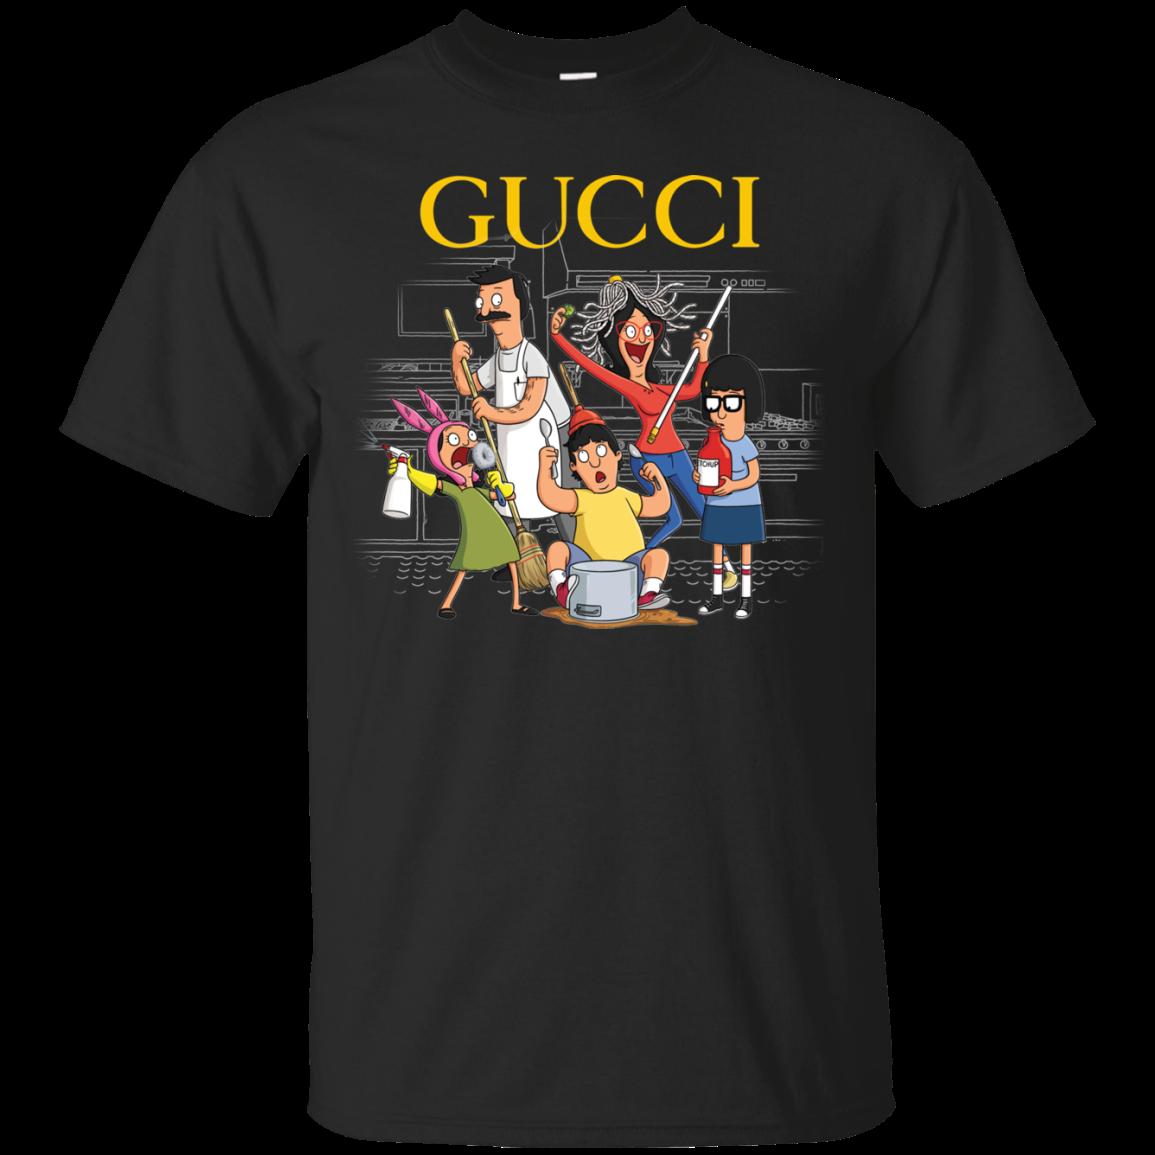 958f8251 Gucci - Bob's Burgers unisex t shirt, tank, long sleeve, hoodie ...